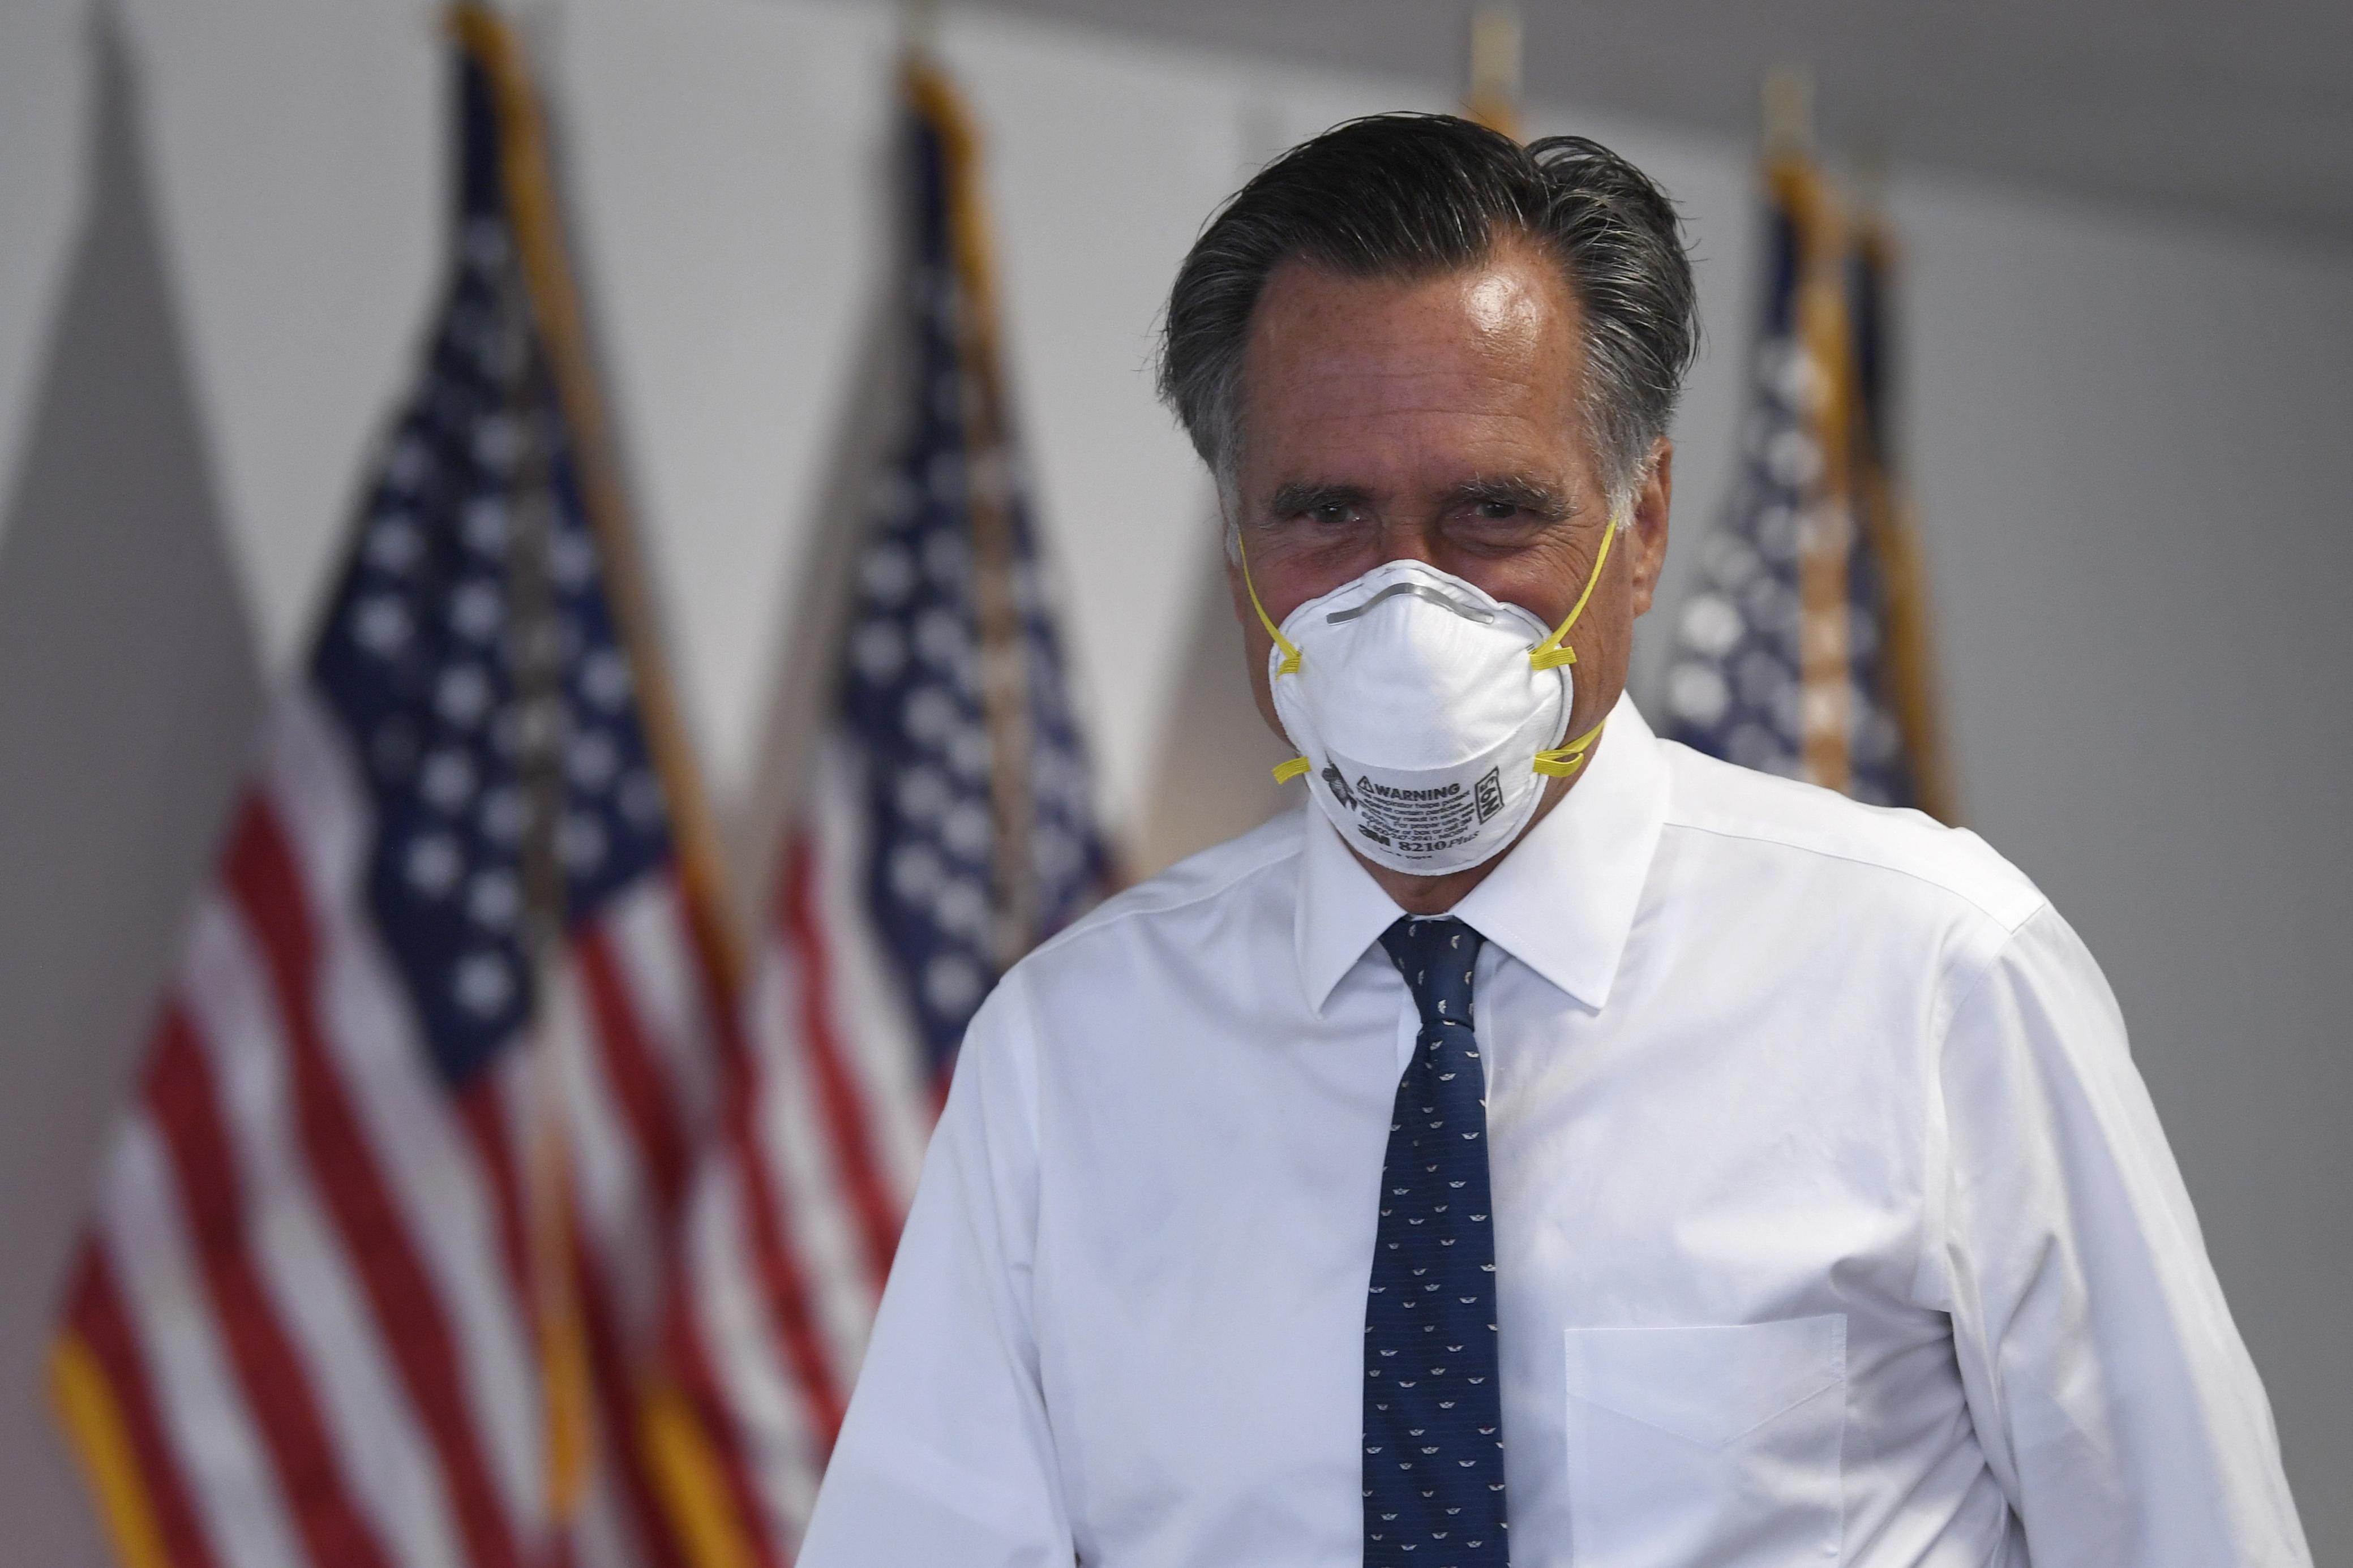 Sen. Mitt Romney, R-Utah, leaves a Republican luncheon on Capitol Hill in Washington, June 4, 2020.